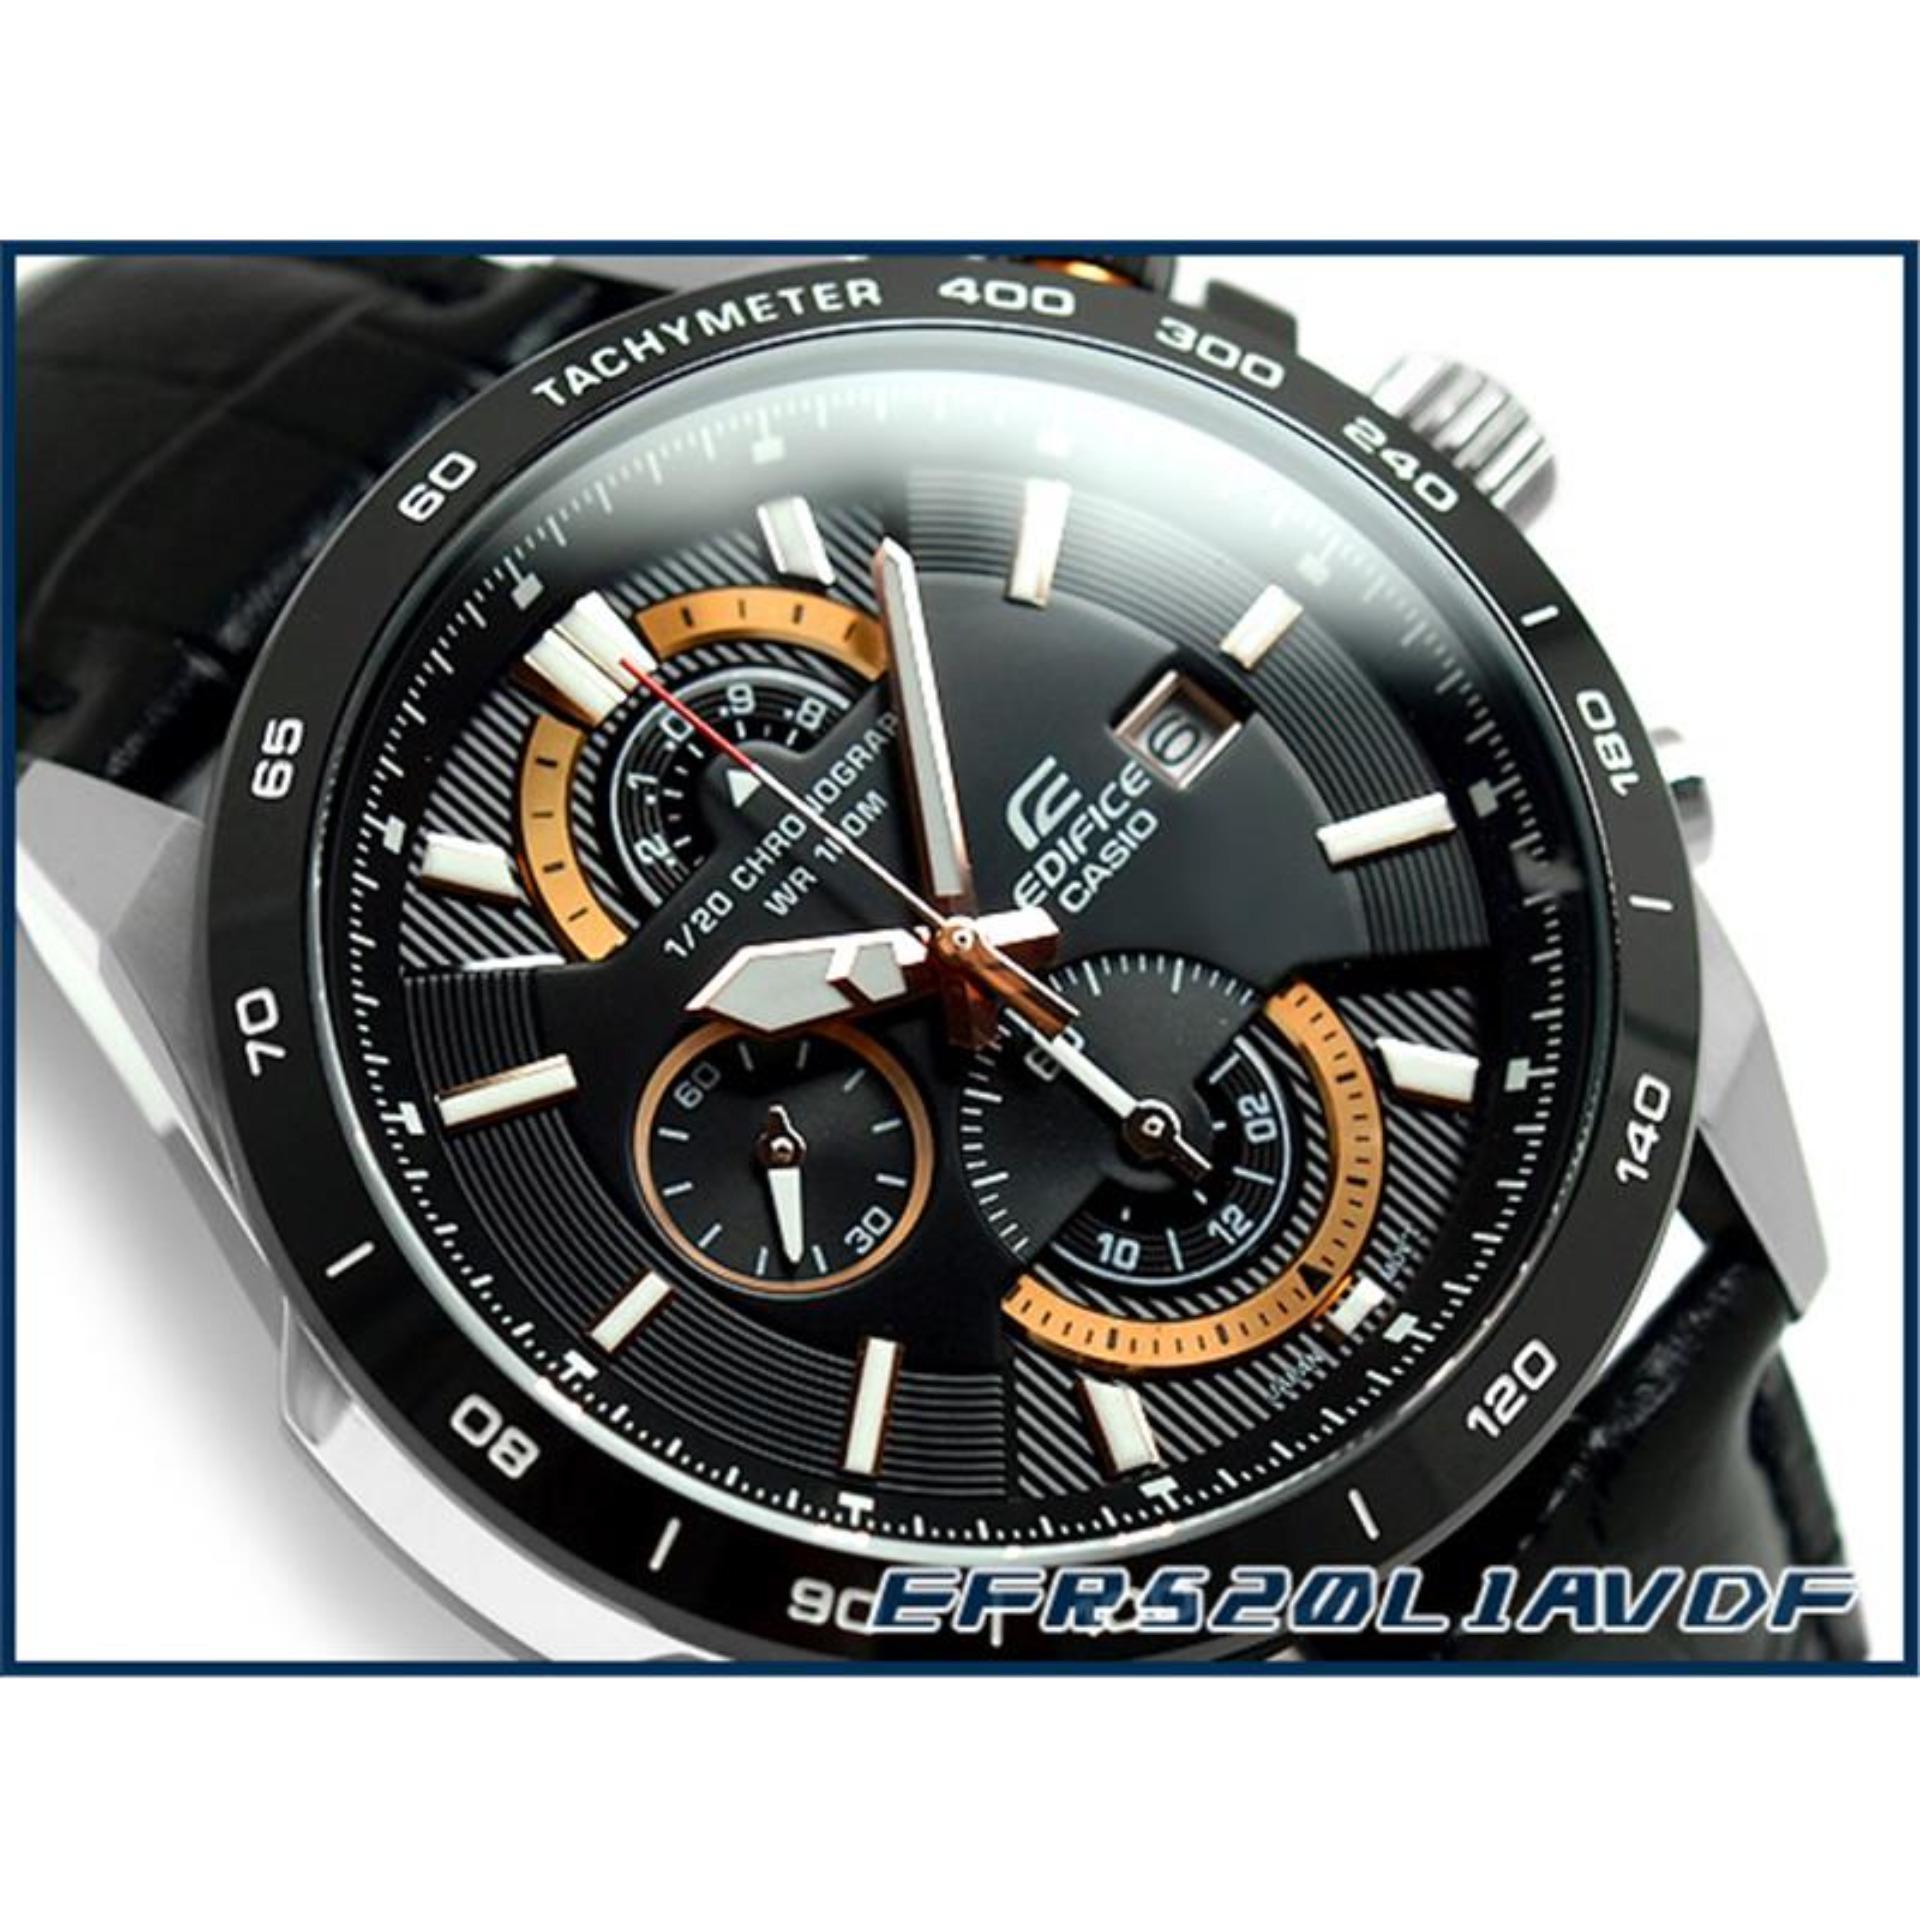 Casio Edifice Efr 520l 1av Jam Tangan Pria Hitam Daftar Harga 522d 1avdf Stainless Steel Black Strapp Leather